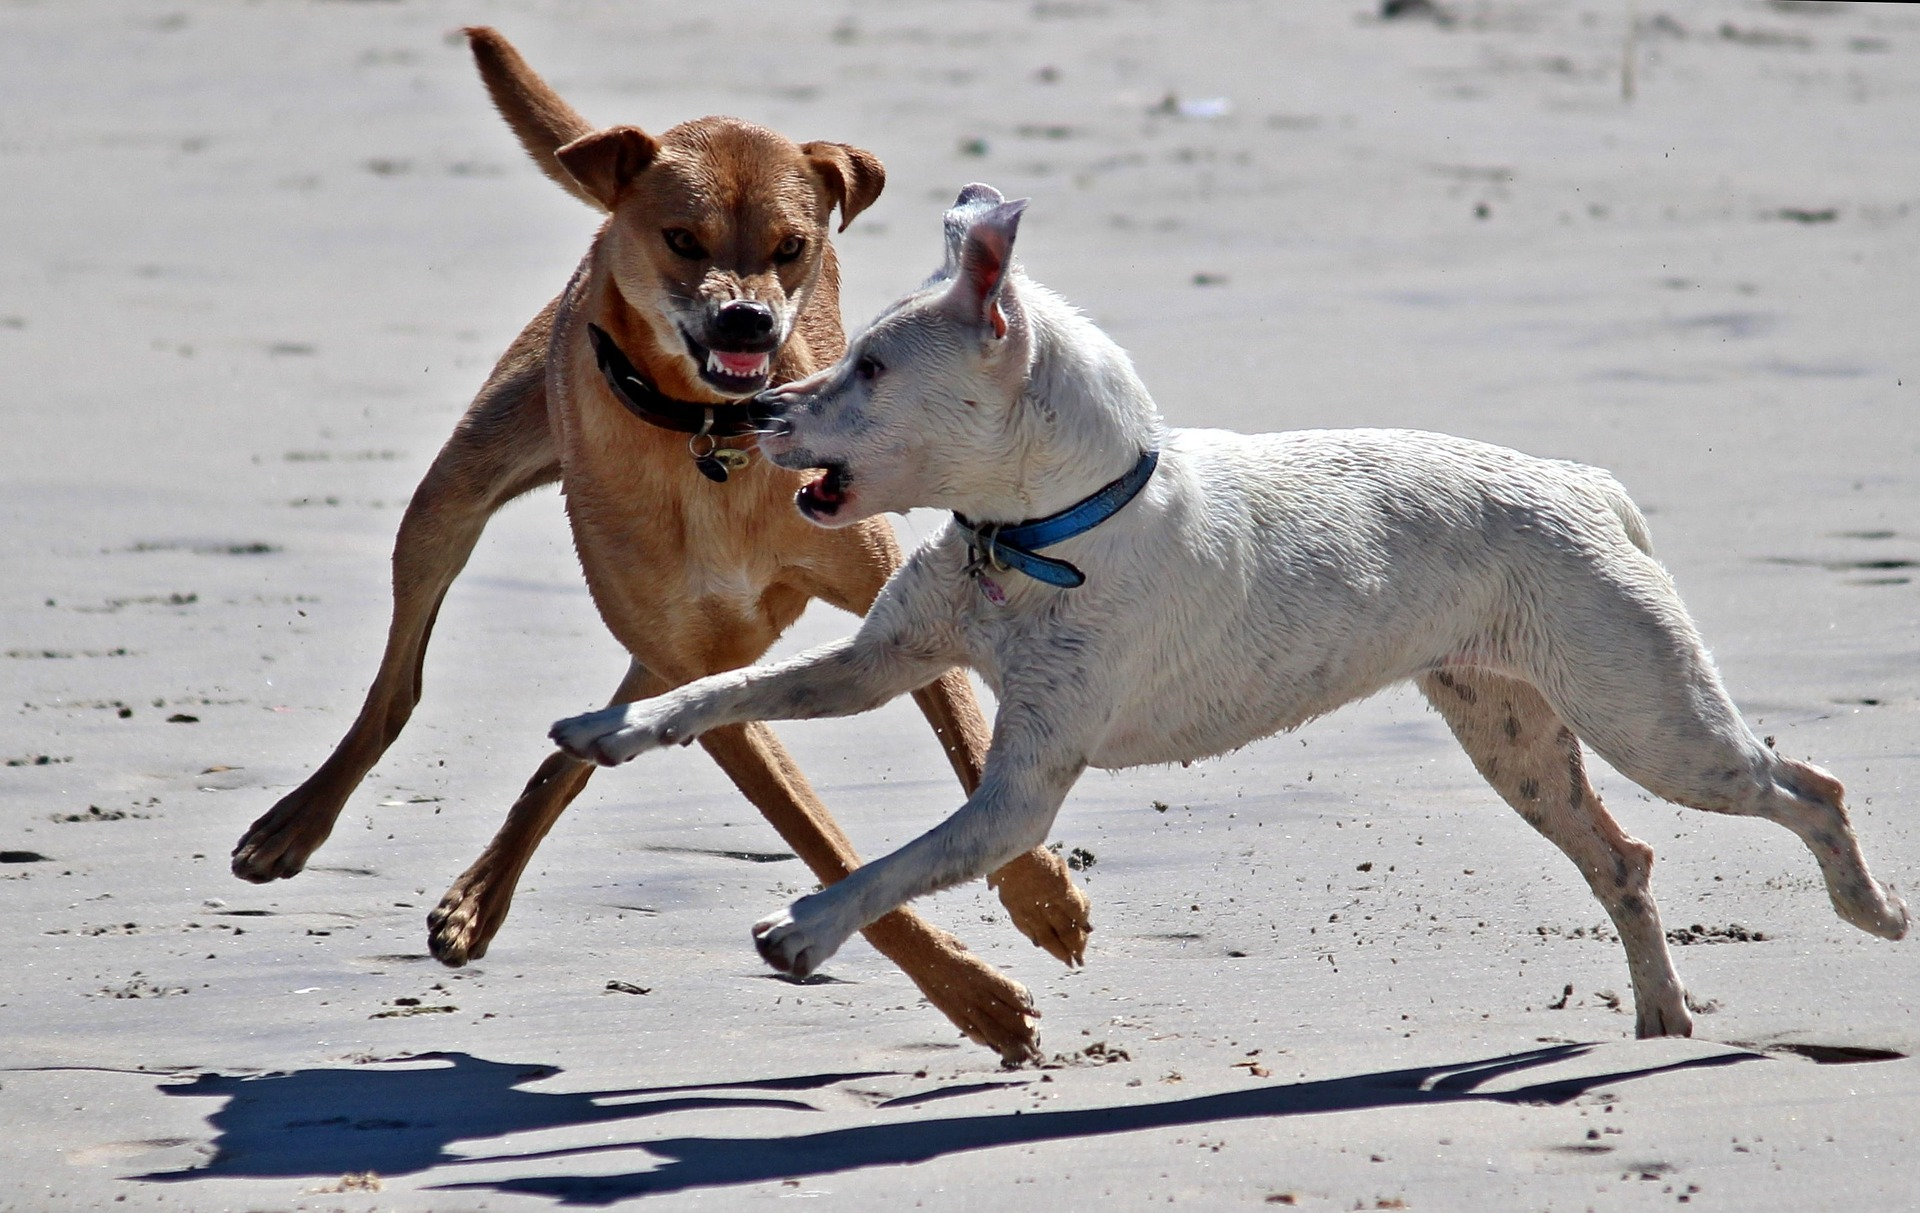 dogs-1345211_1920.jpg